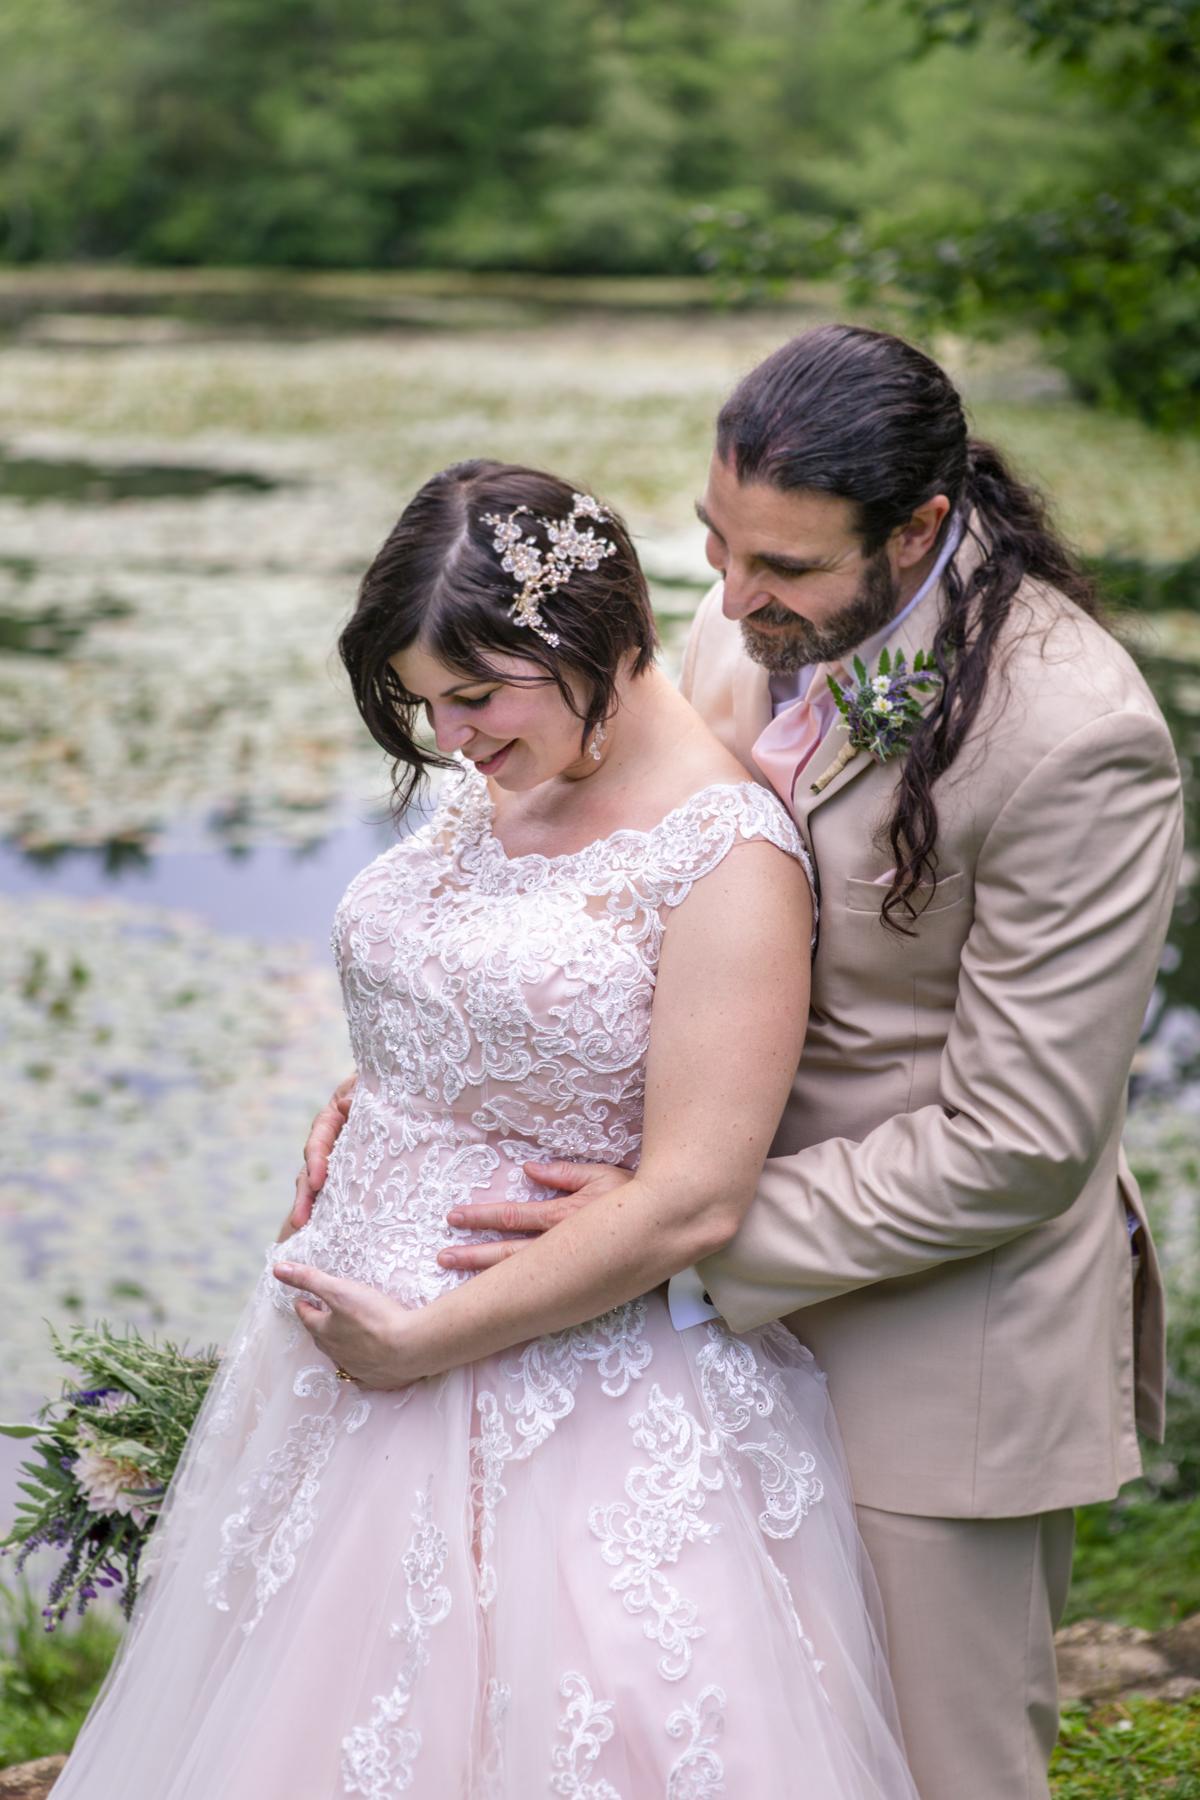 Avyanna and Phoenix Wedding 2019_photos by Studio Misha_BLOG-138.jpg